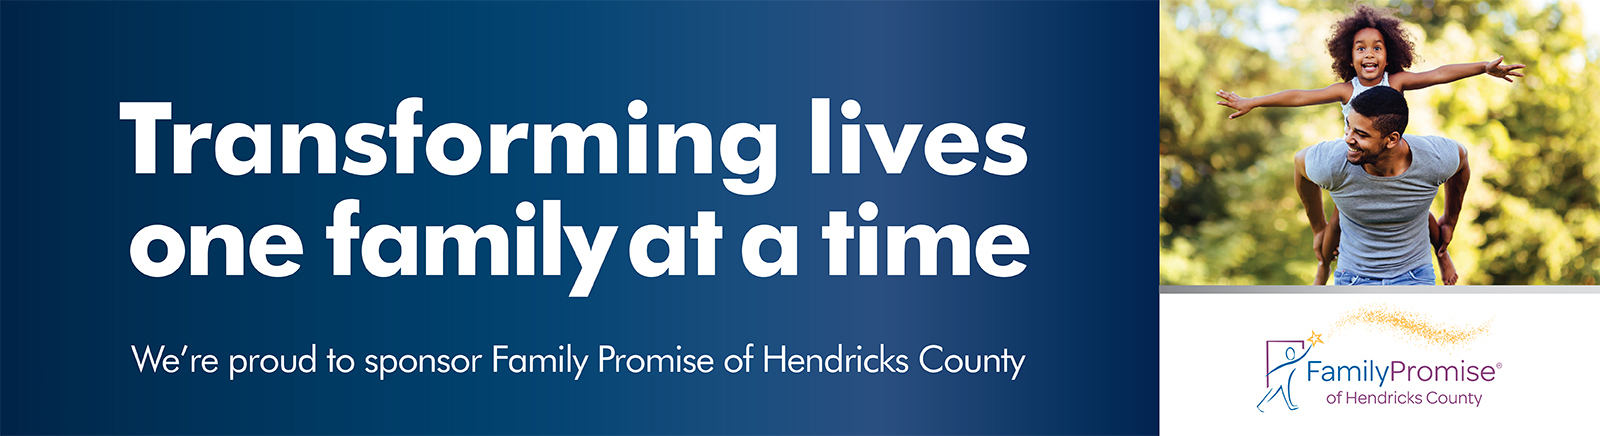 We support Family Promise of Hendricks County